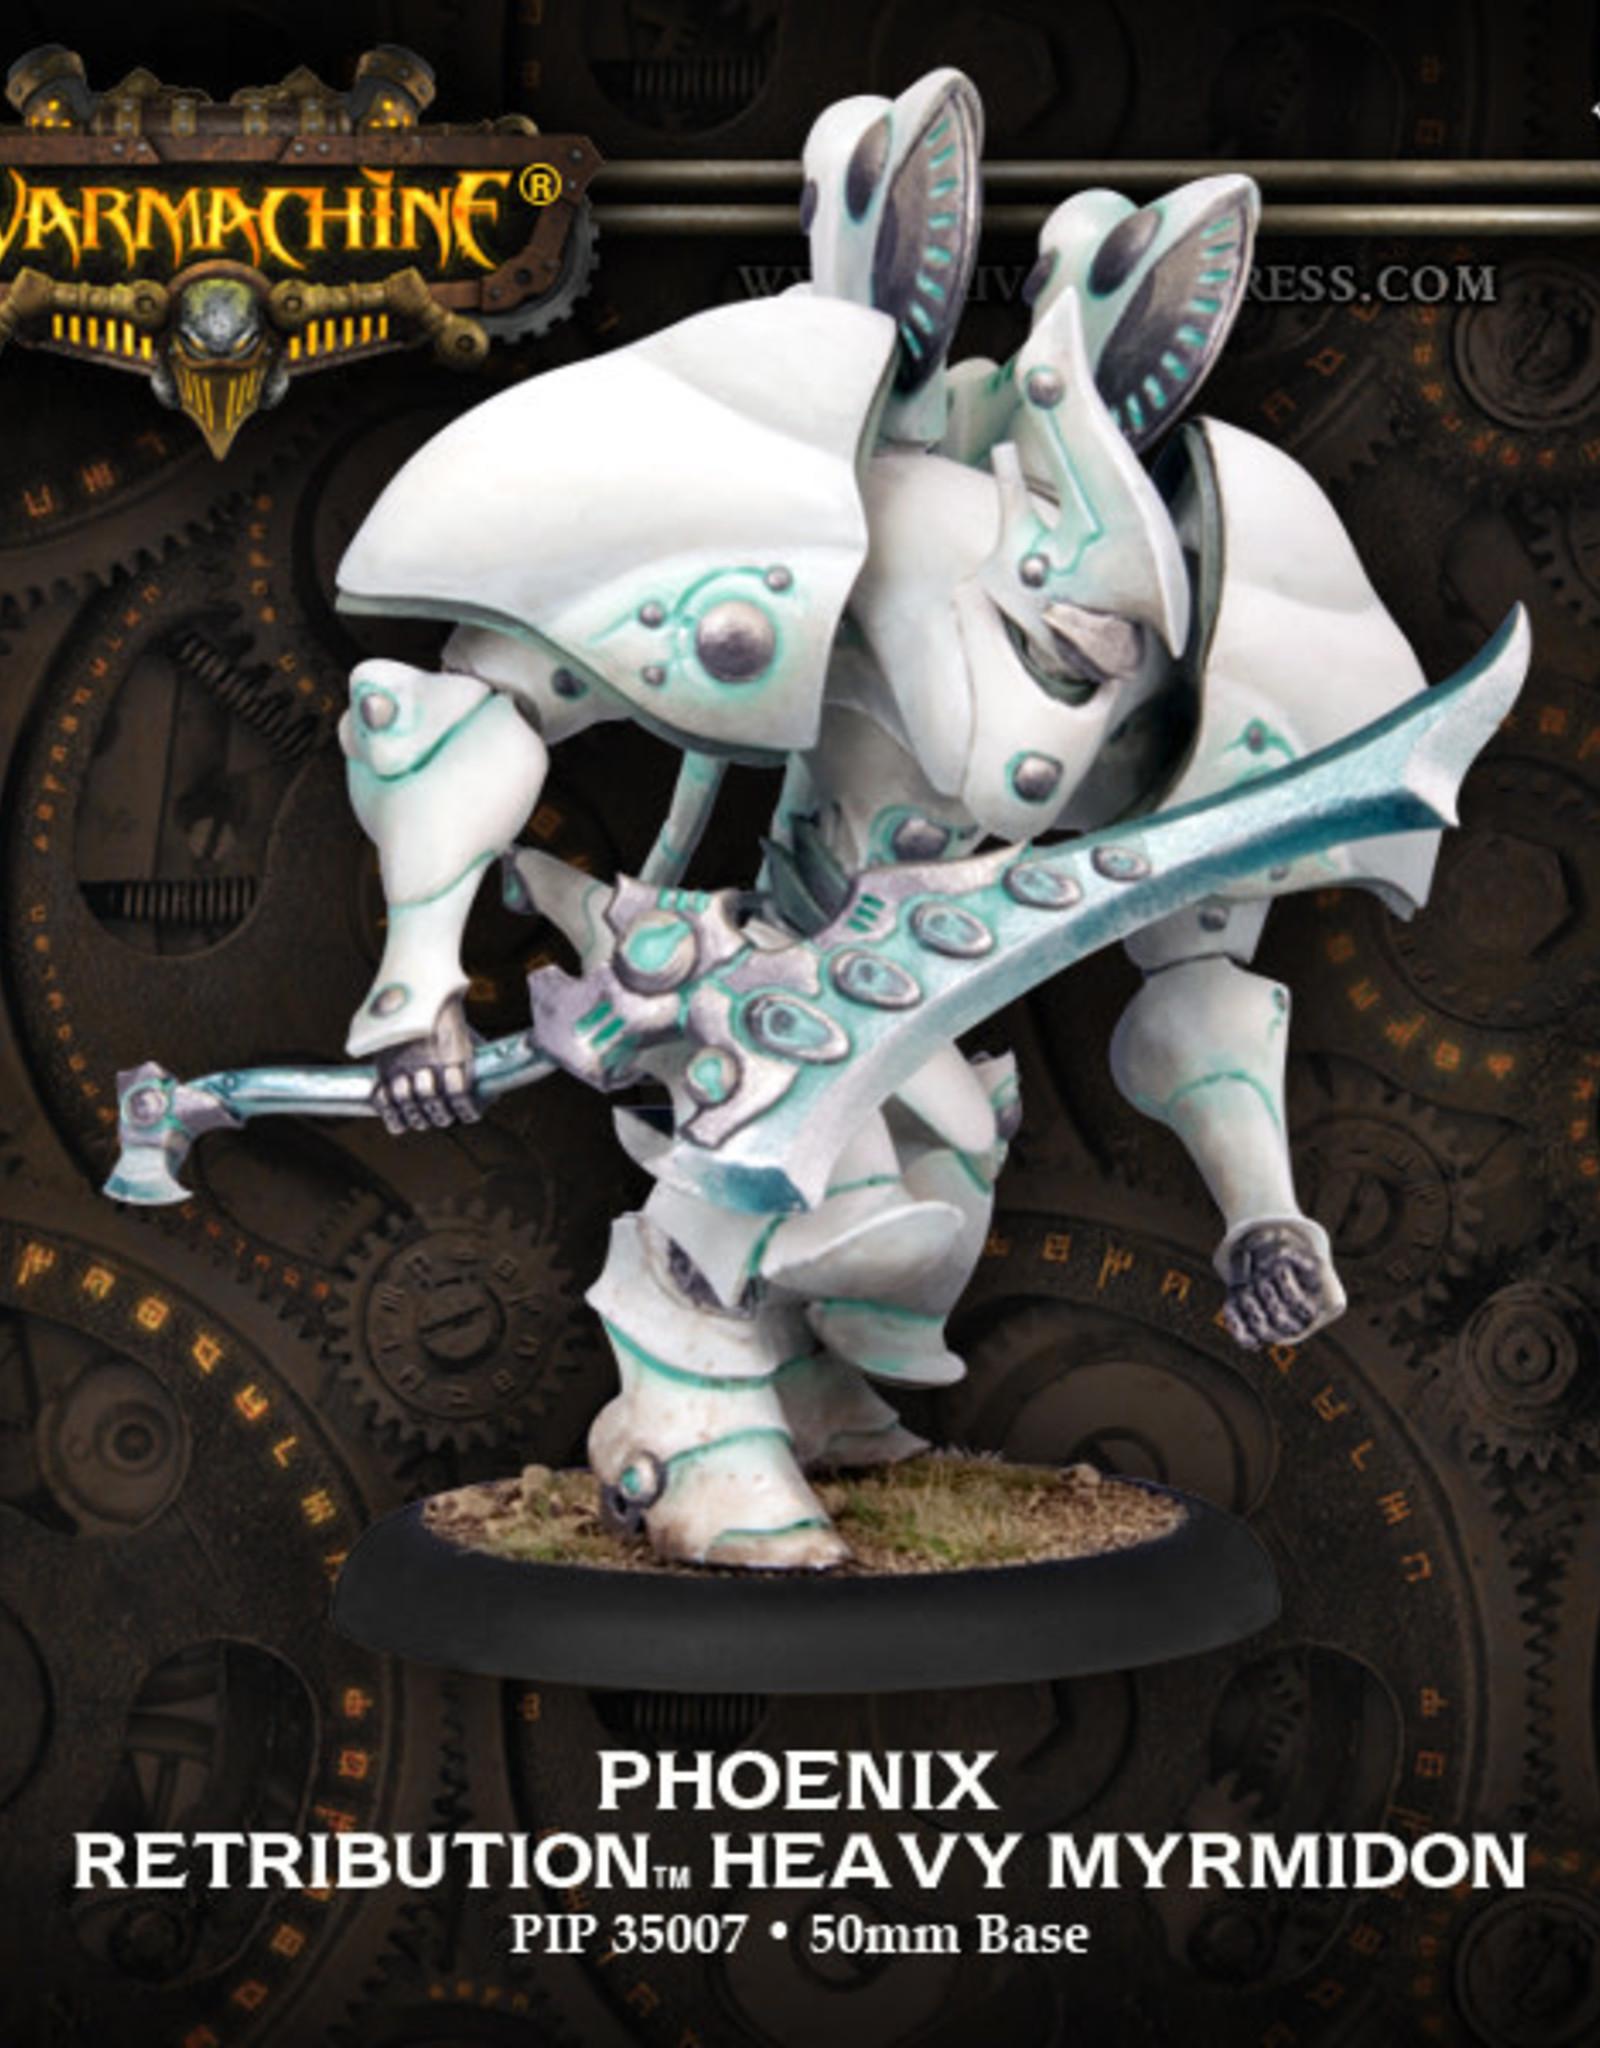 Warmachine Scyrah - Heavy Mirmidon Hydra/Manticore/Phoenix